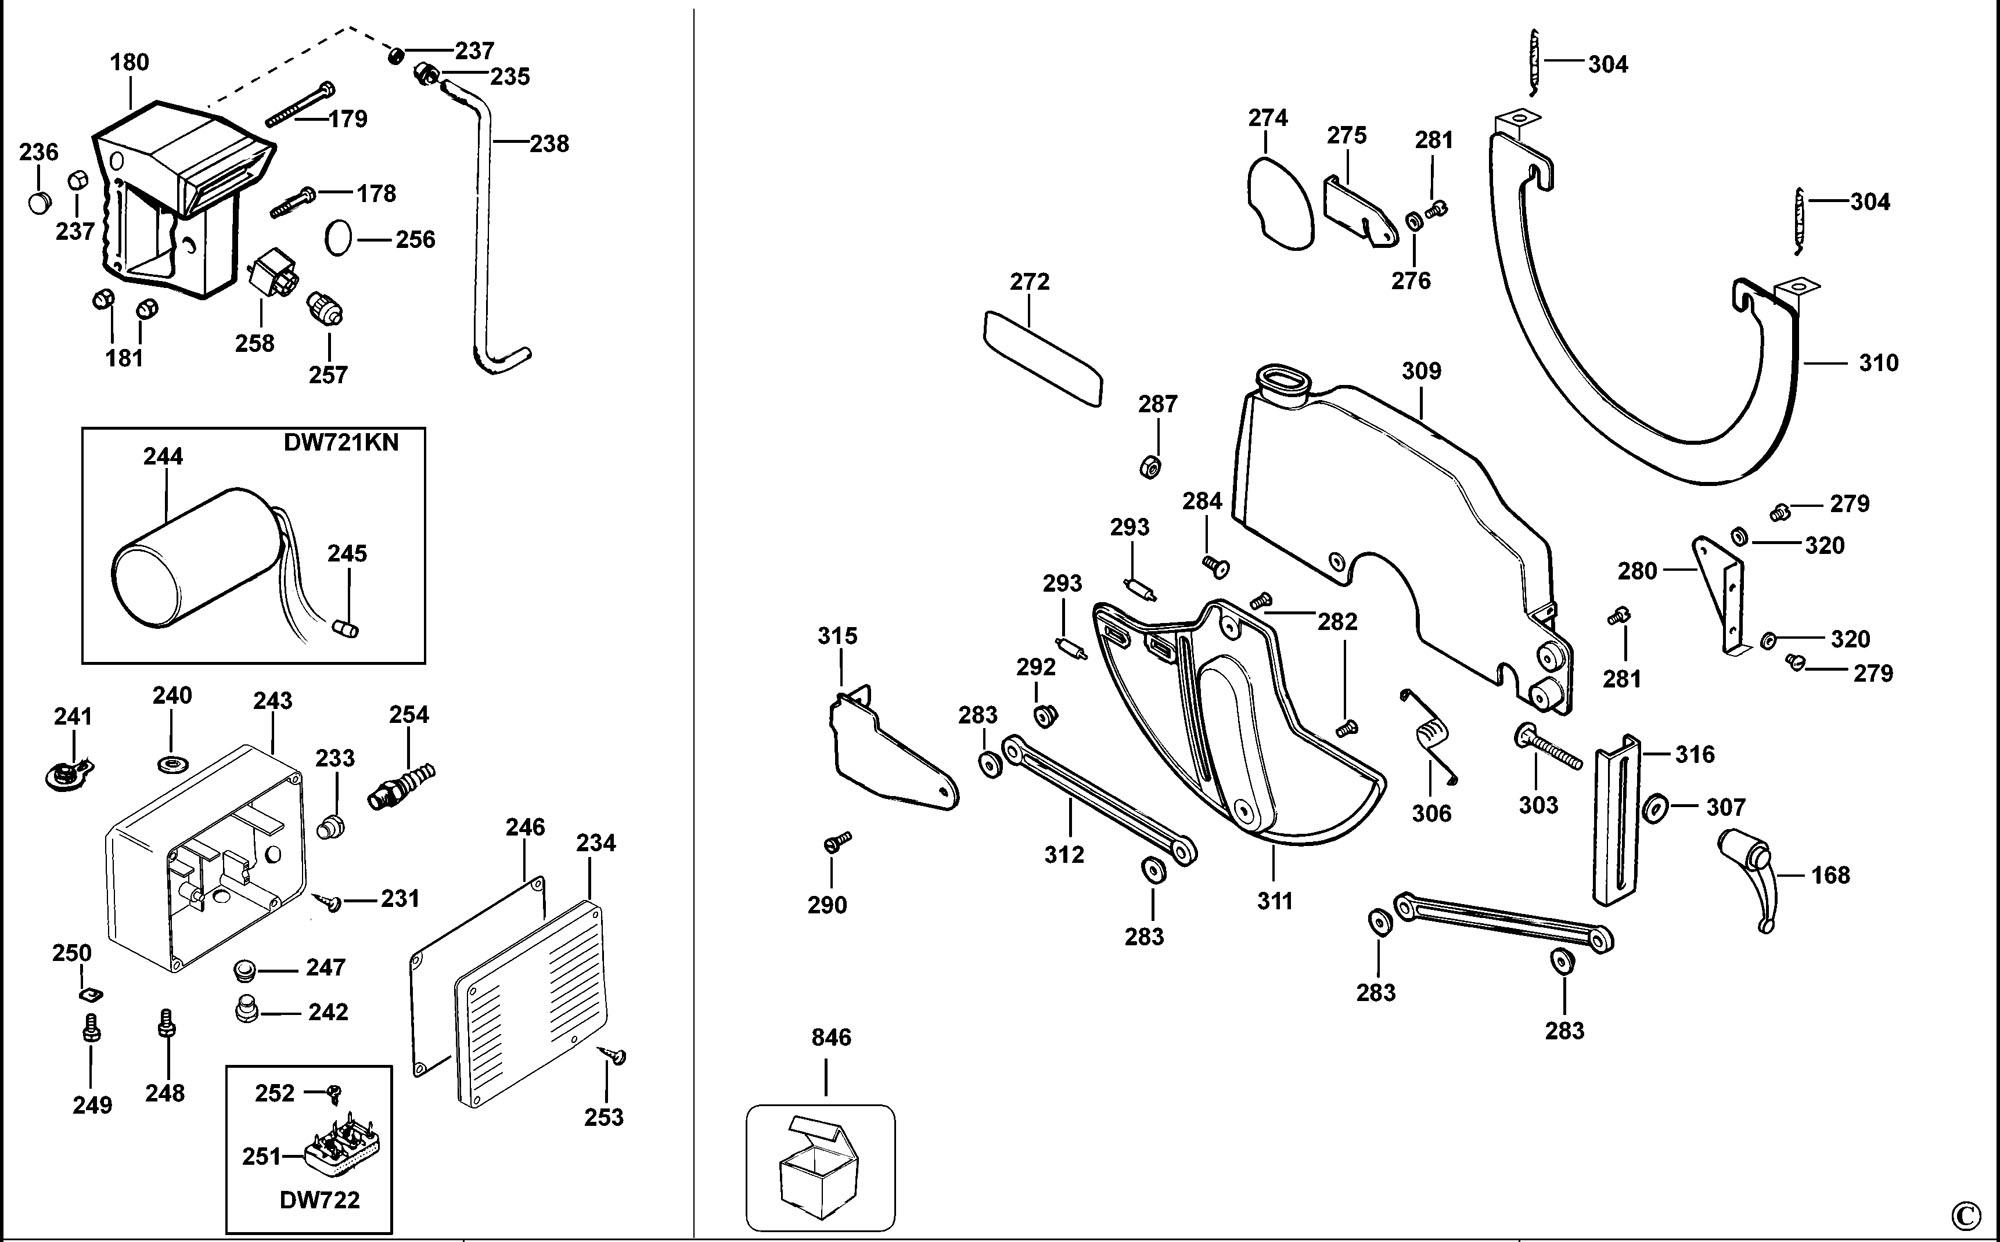 Spares for Dewalt Dw721kn Radial Arm Saw (type 1) SPARE